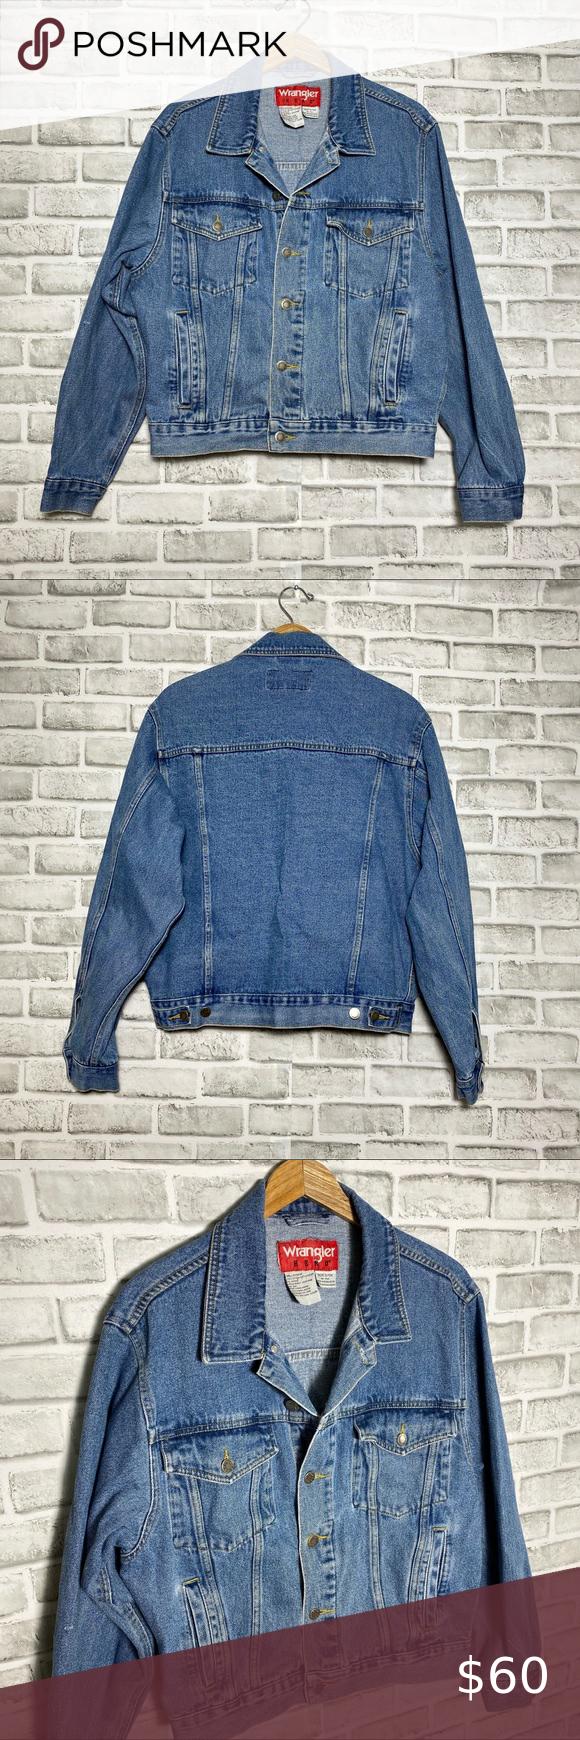 Vintage Wrangler Hero Unisex Denim Jean Jacket Denim Jean Jacket Vintage Wrangler Denim Jeans [ 1740 x 580 Pixel ]